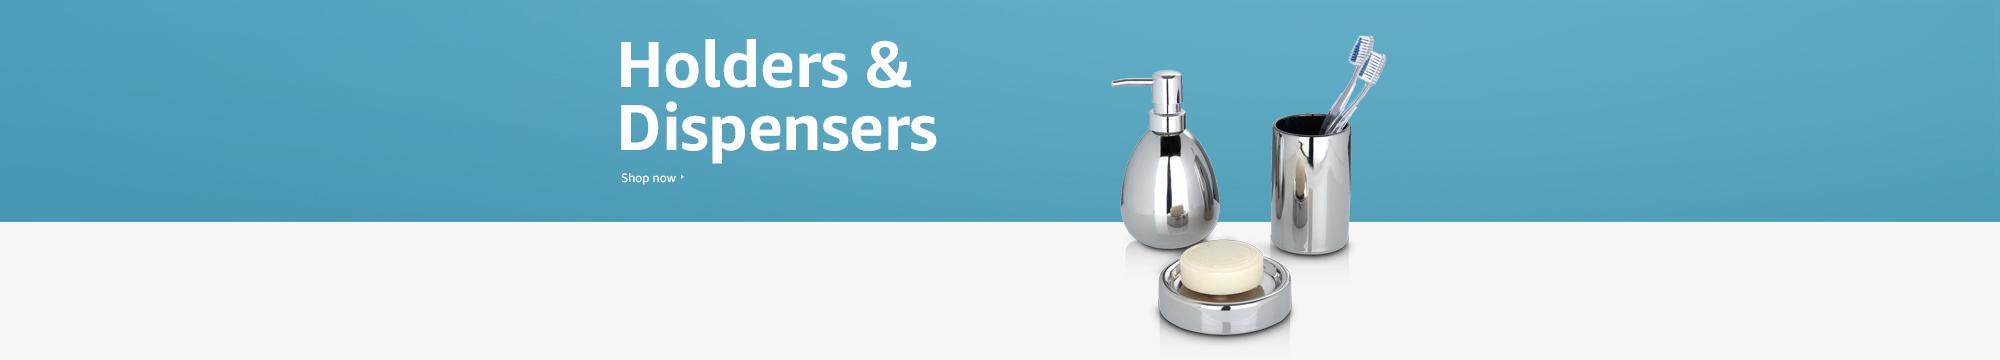 Holders & Dispensers